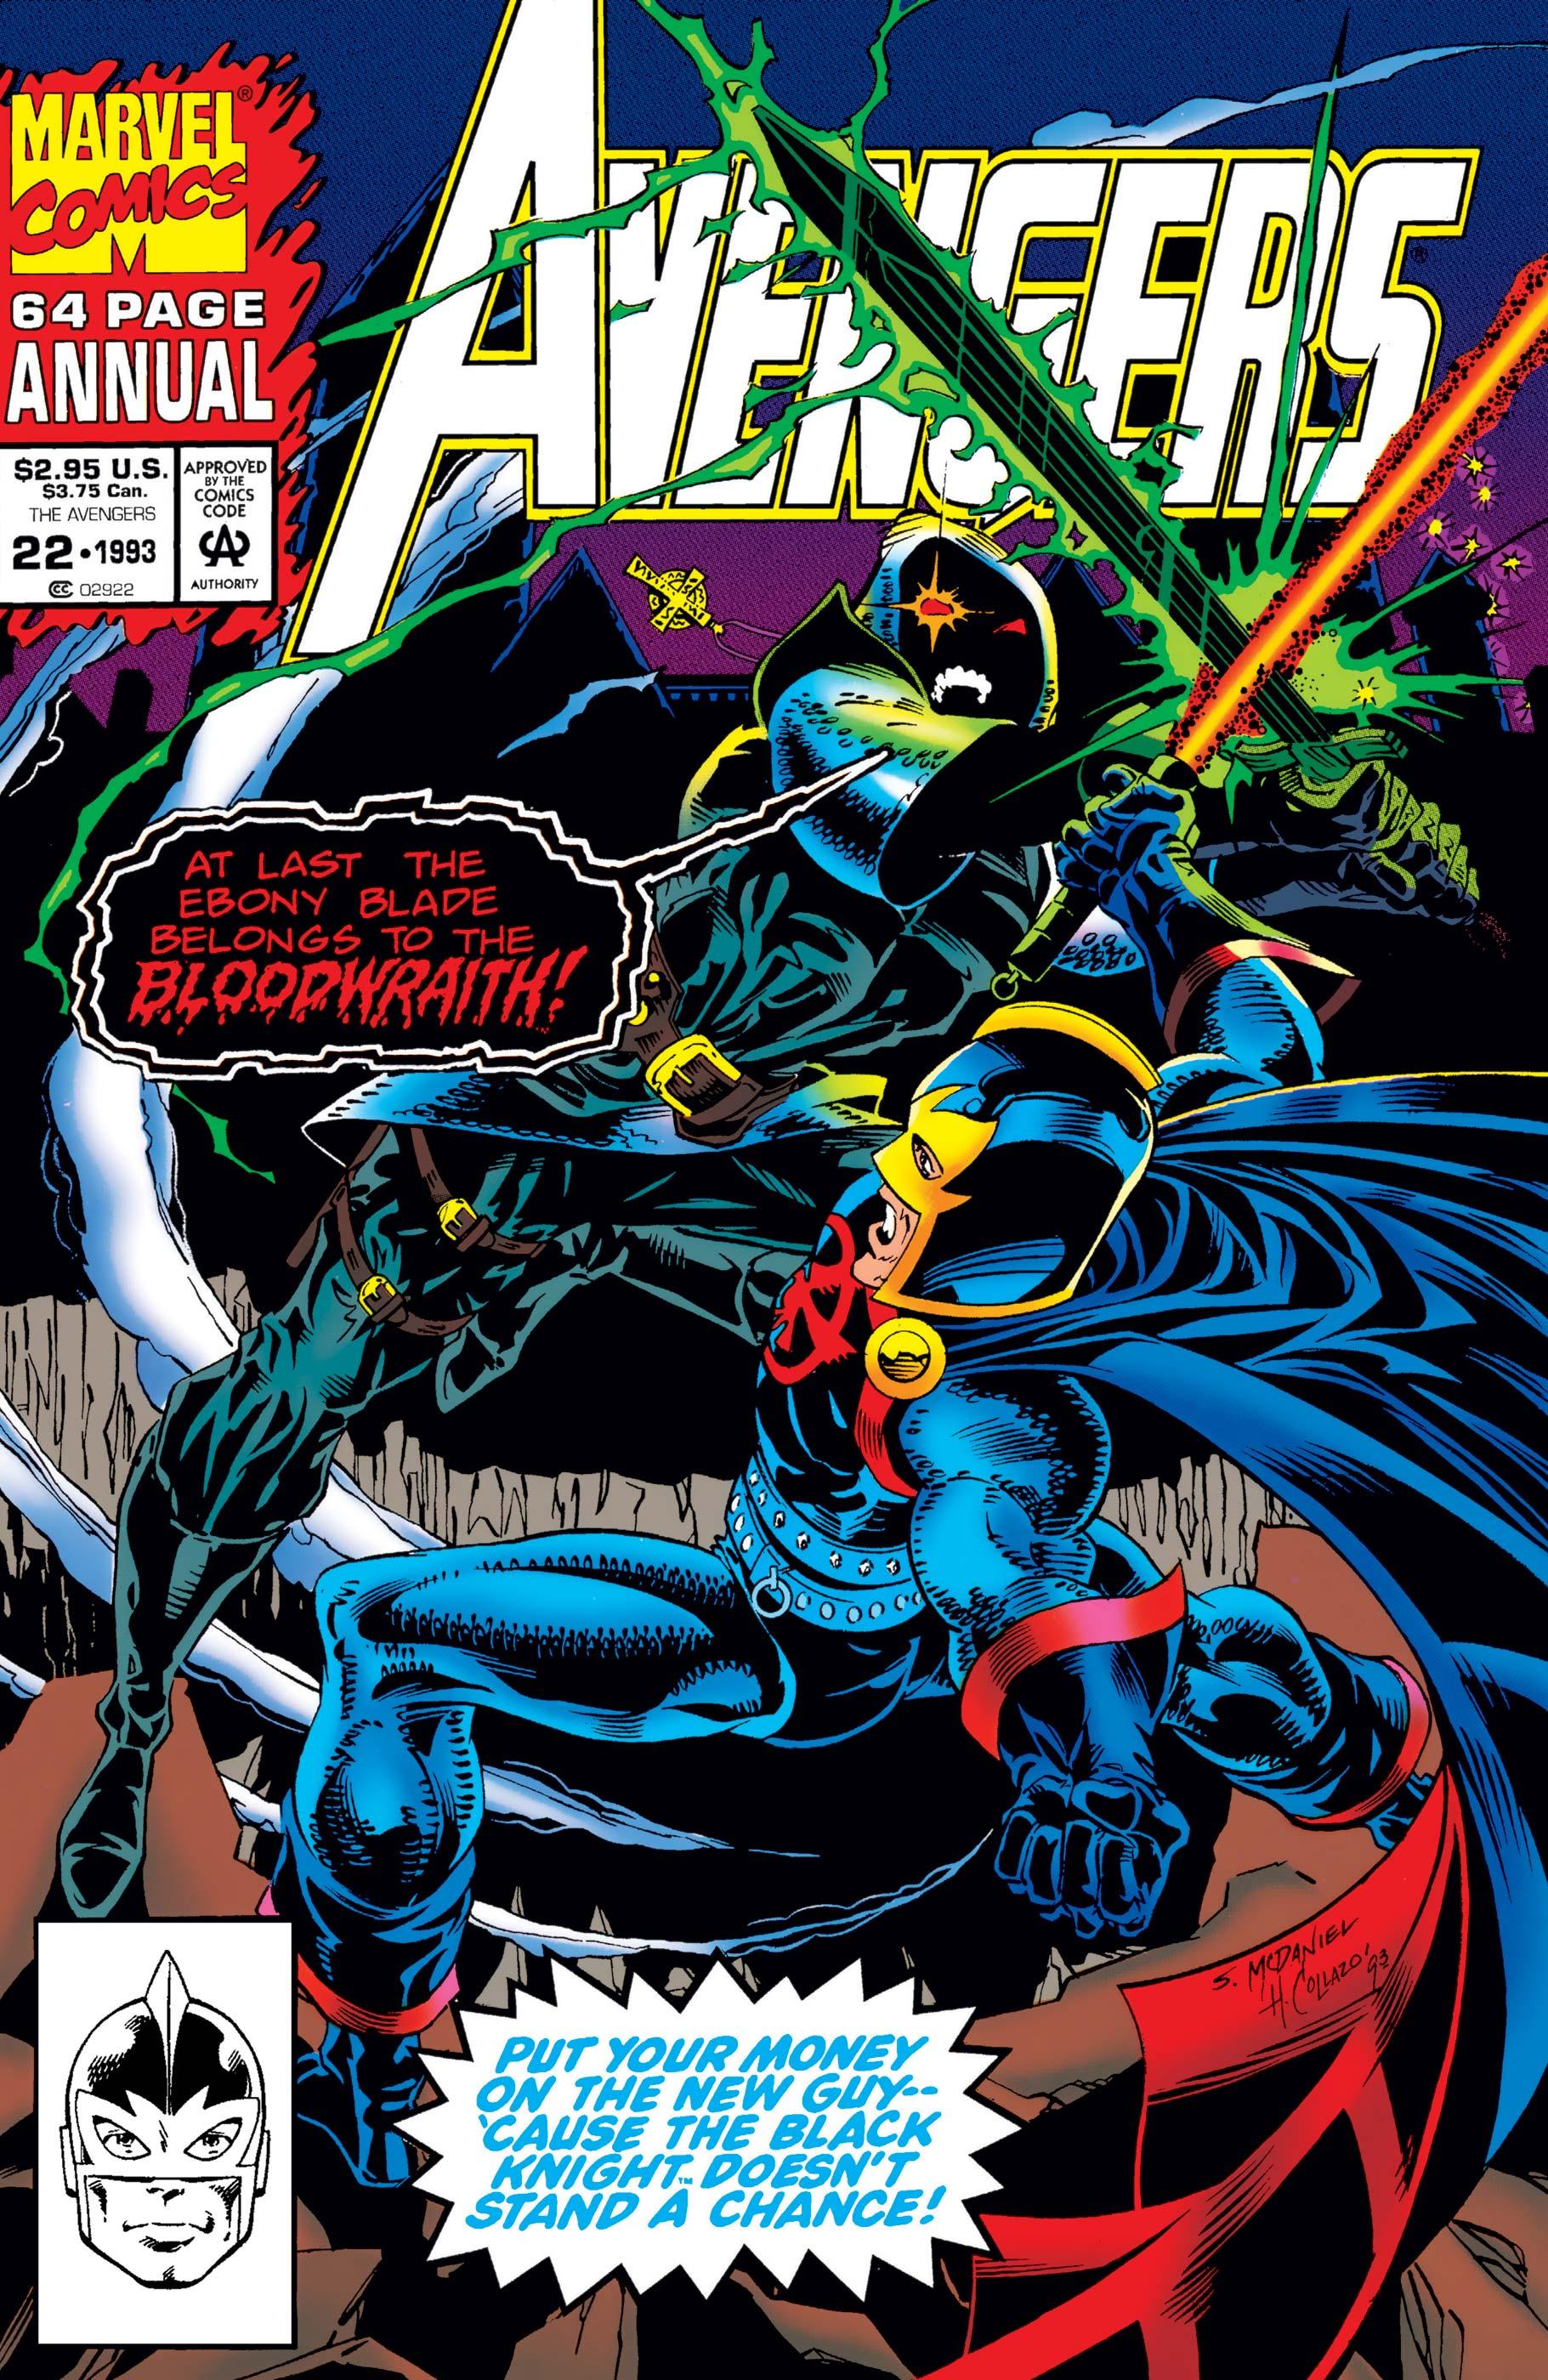 Avengers Annual (1967) #22